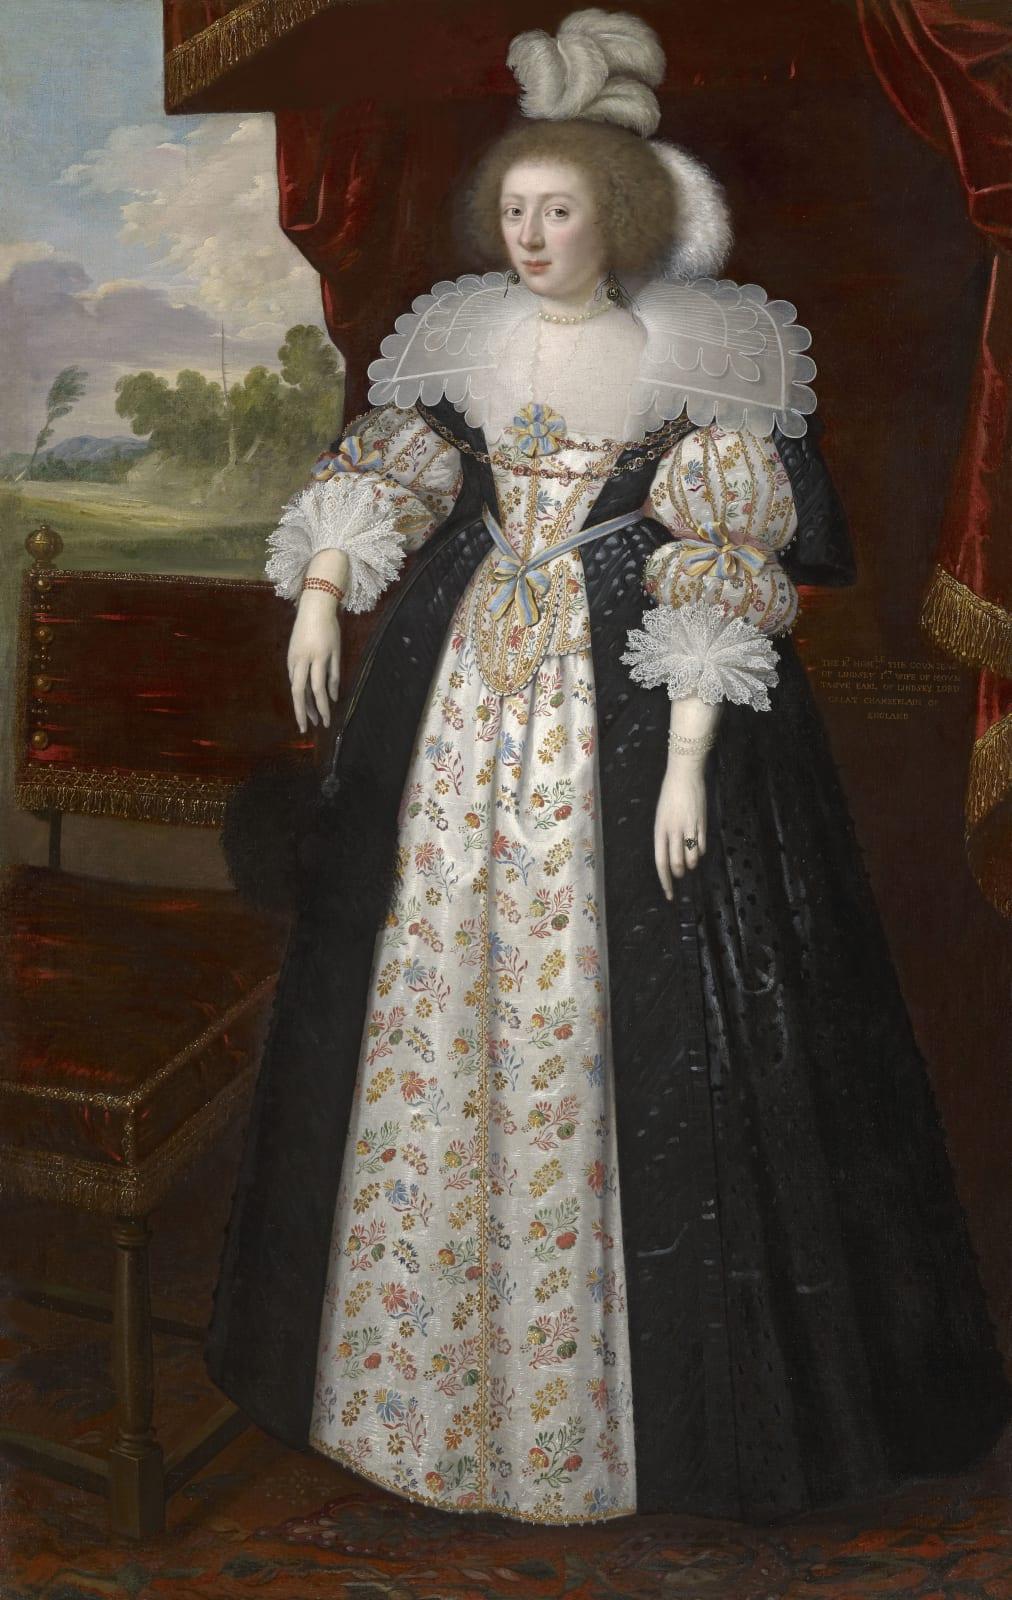 Martha Bertie (née Cockayne), Countess of Lindsey (1605 – 1641)